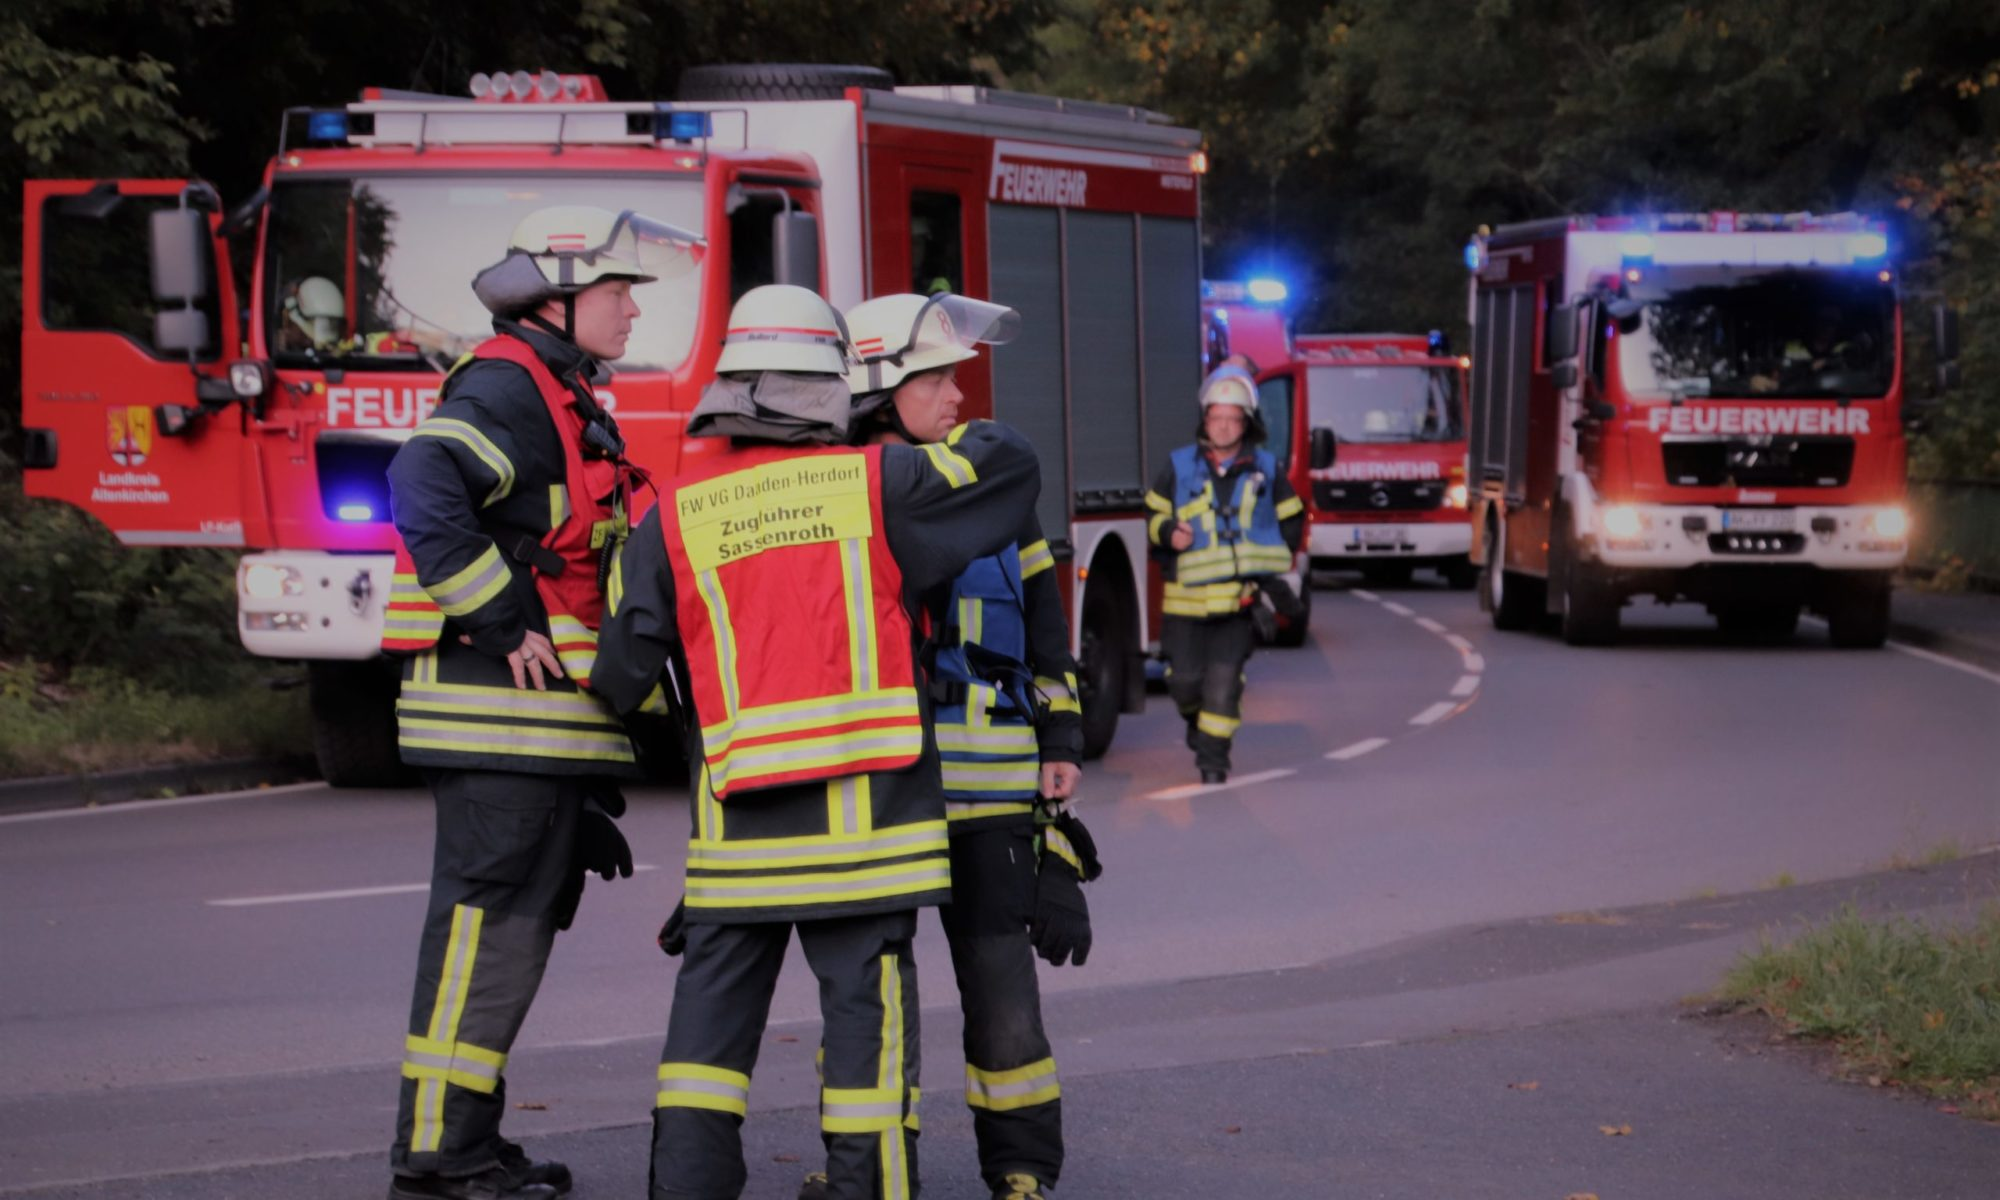 Feuerwehr VG Daaden-Herdorf